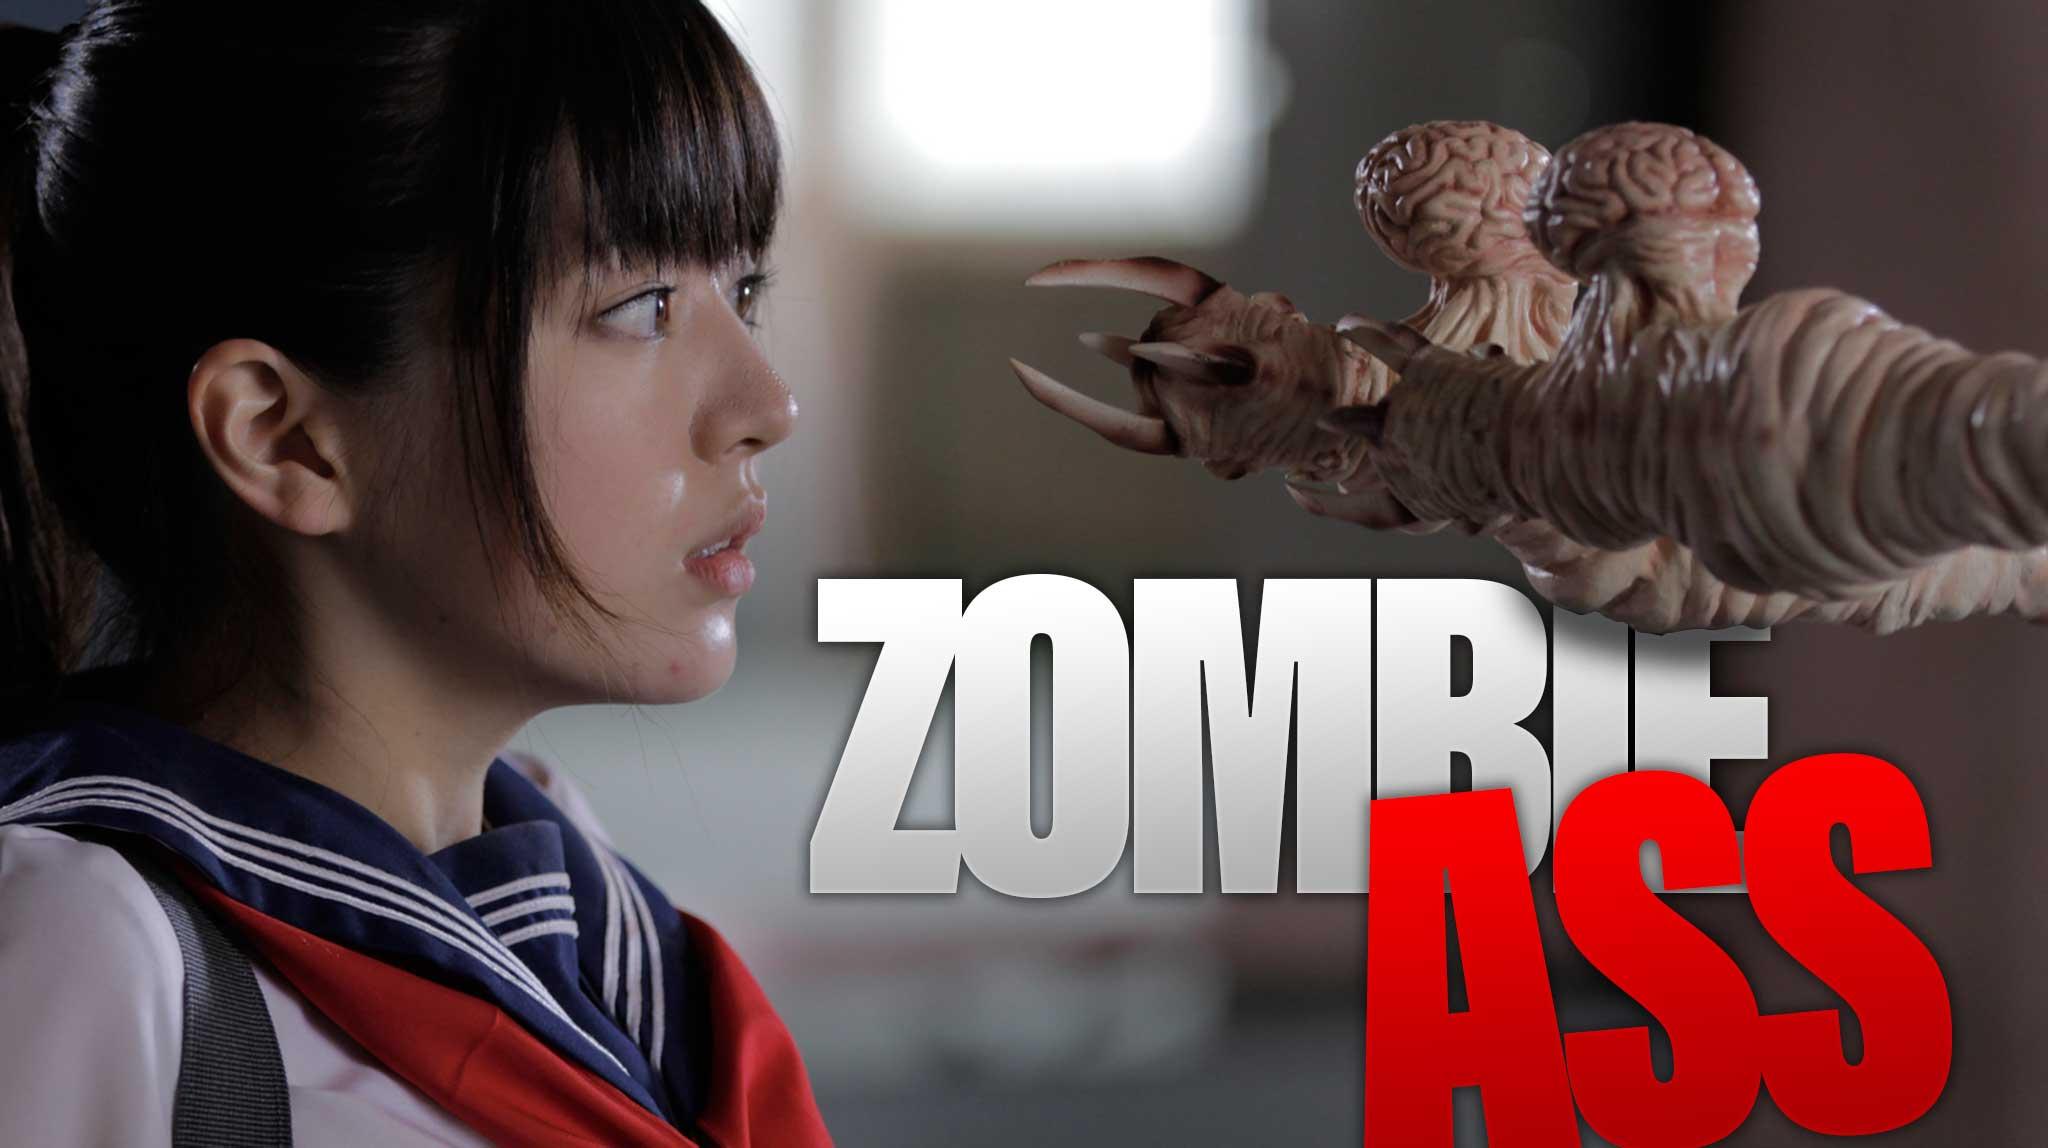 zombie-ass-toilet-of-the-dead\header.jpg